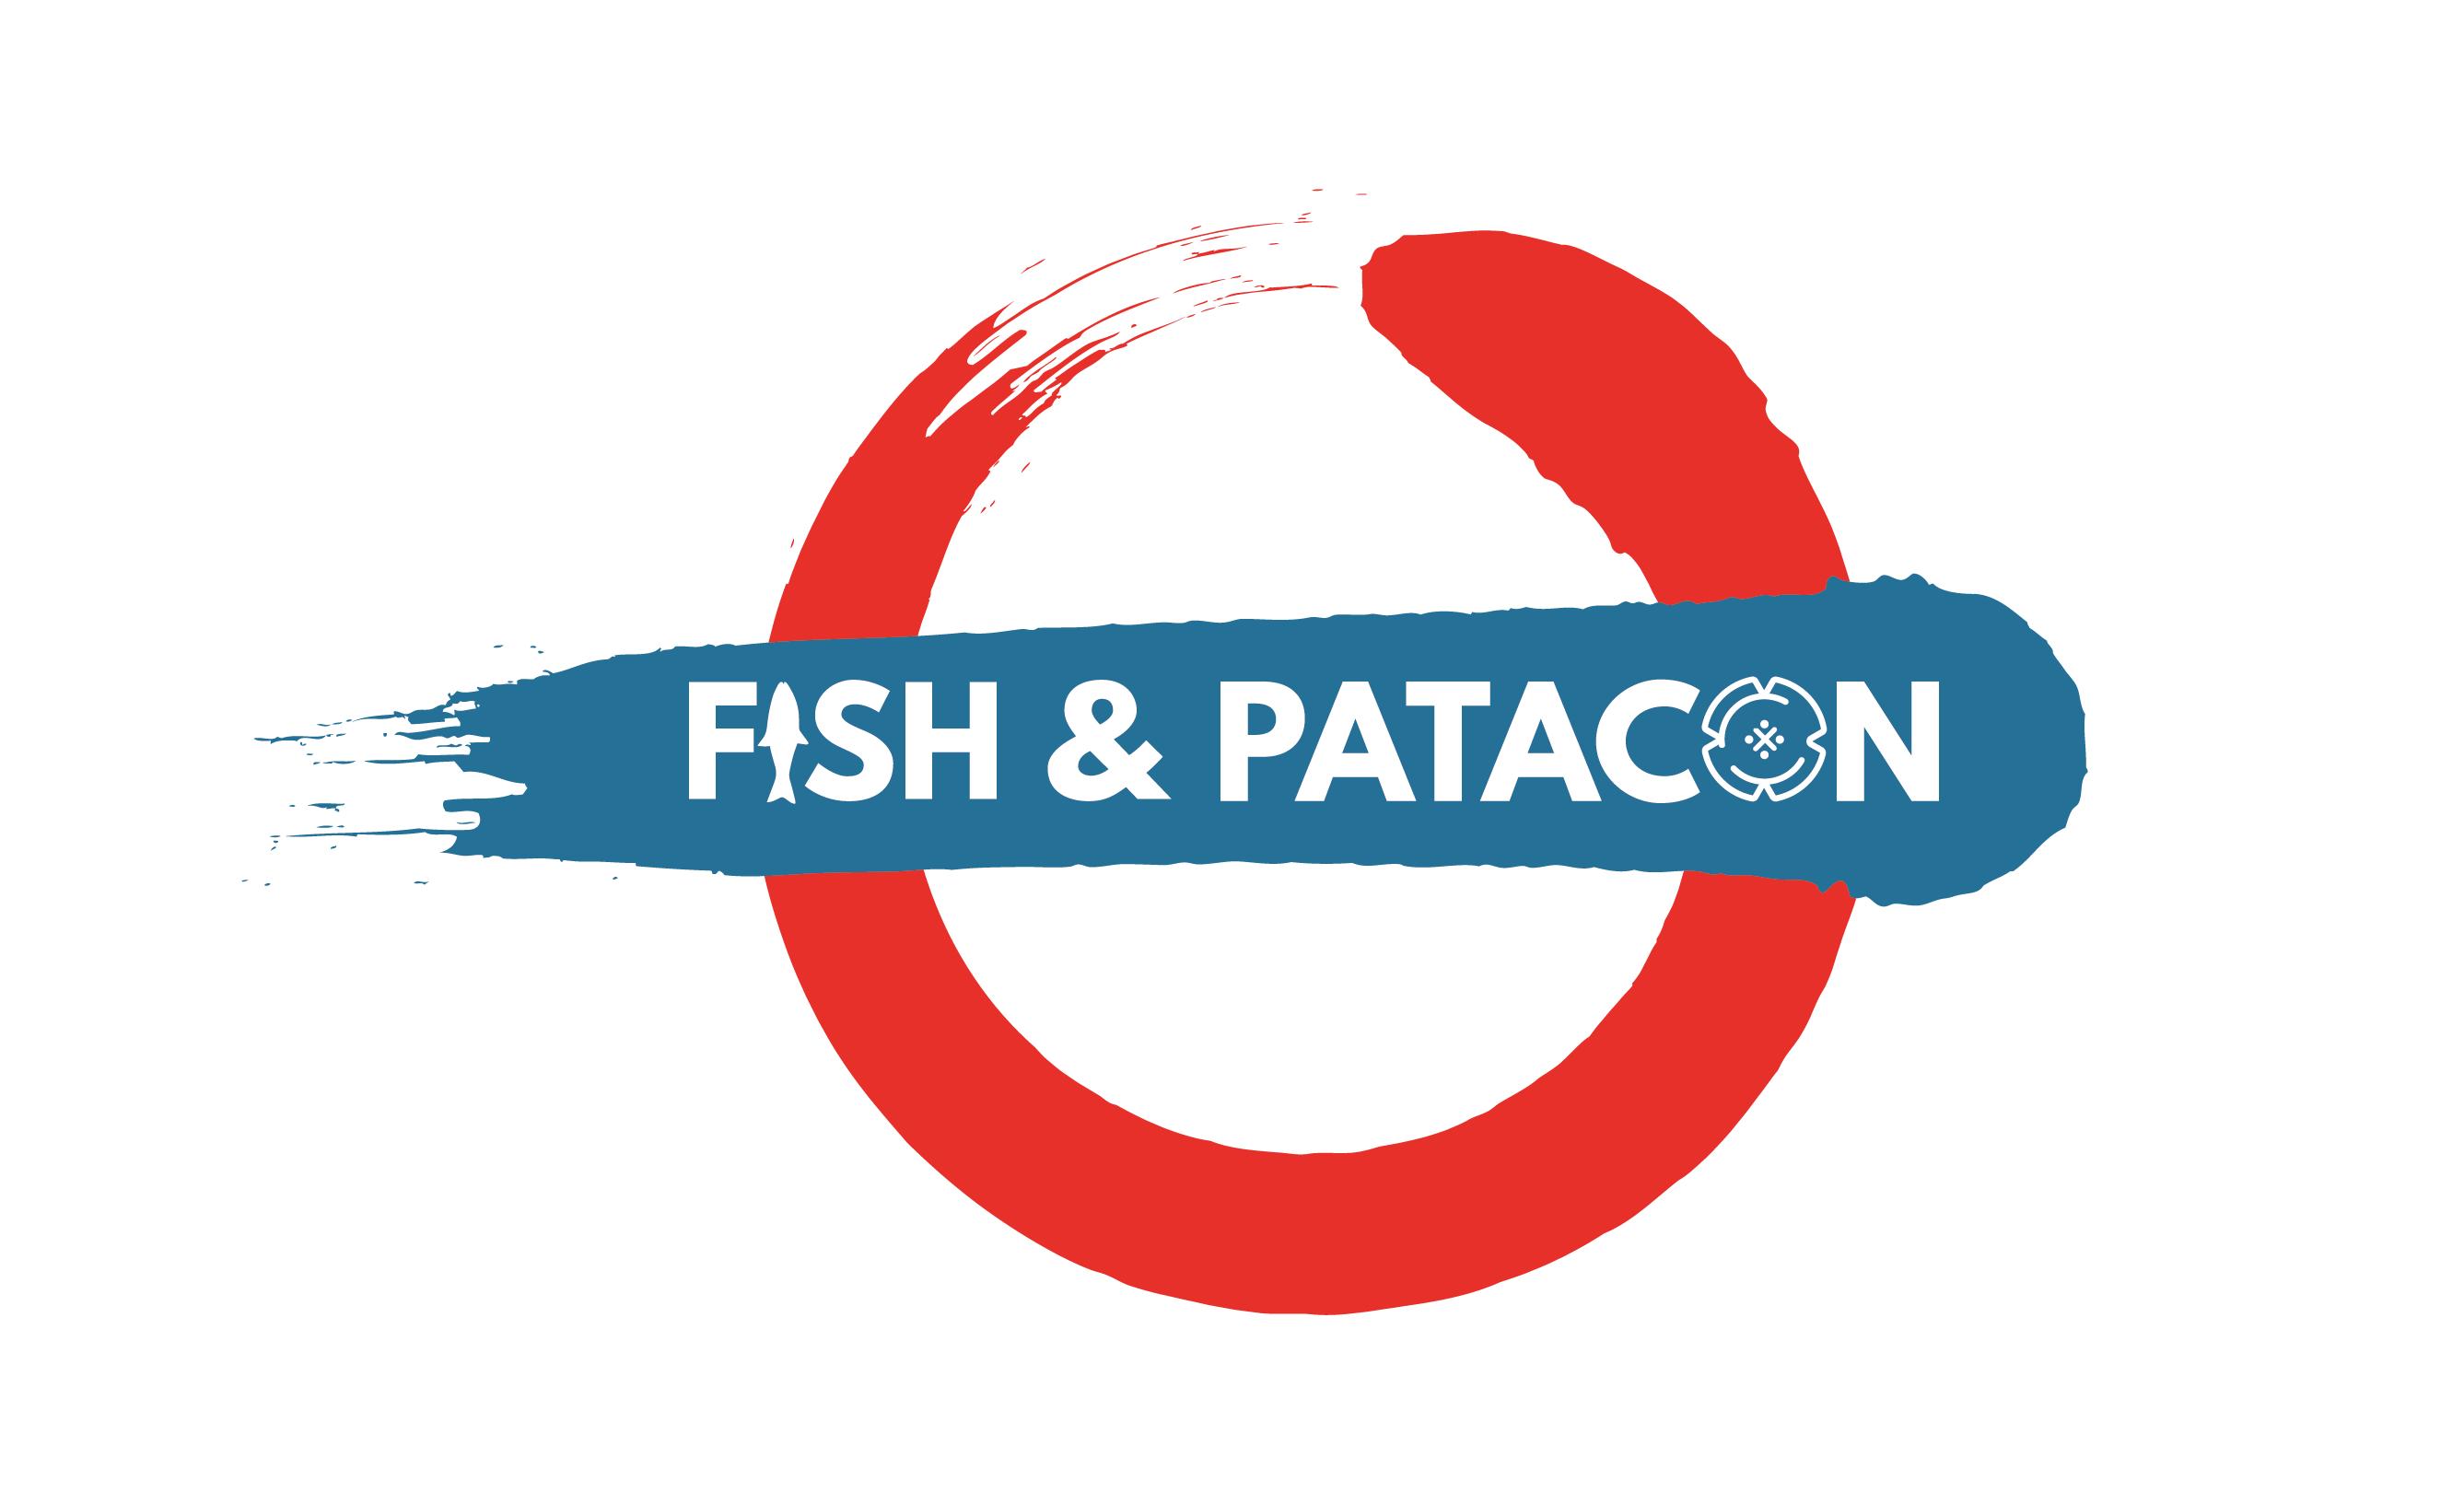 Fish & Patacon logo